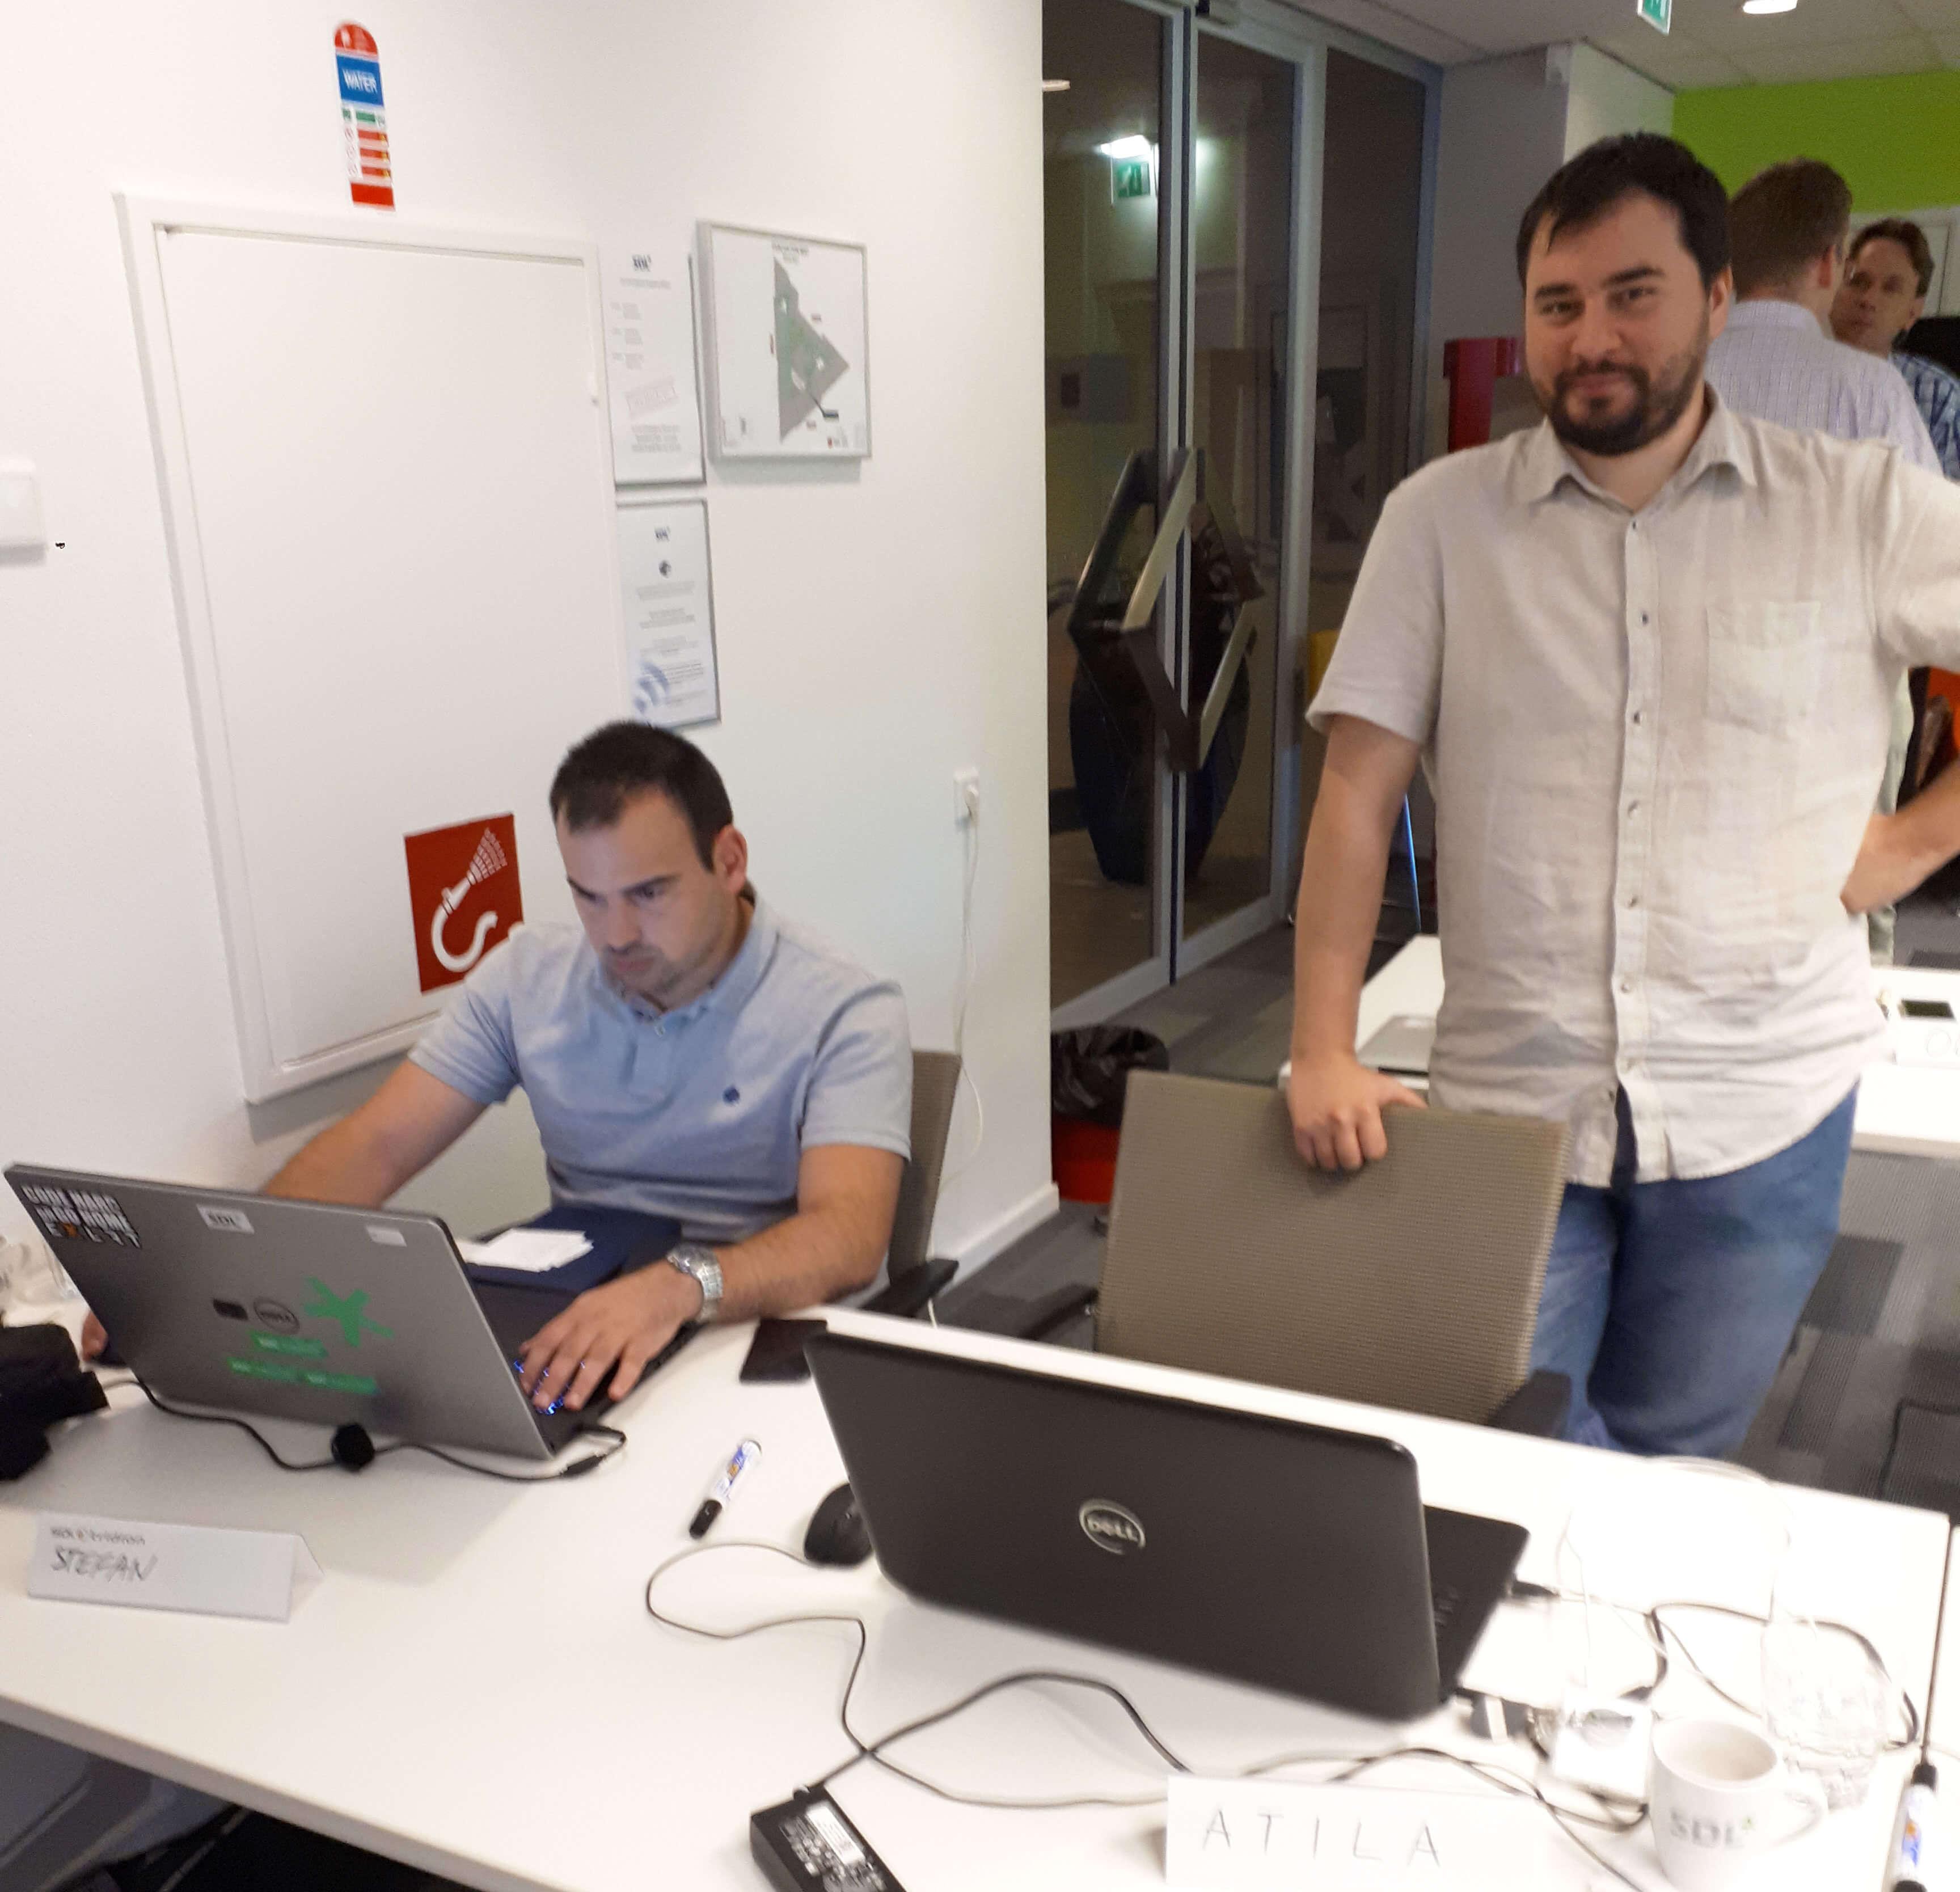 EXLRT at the SDL Tridion Sites 9 technical bootcamp (Stefan Klašnić – left, Atila Šoš – right)